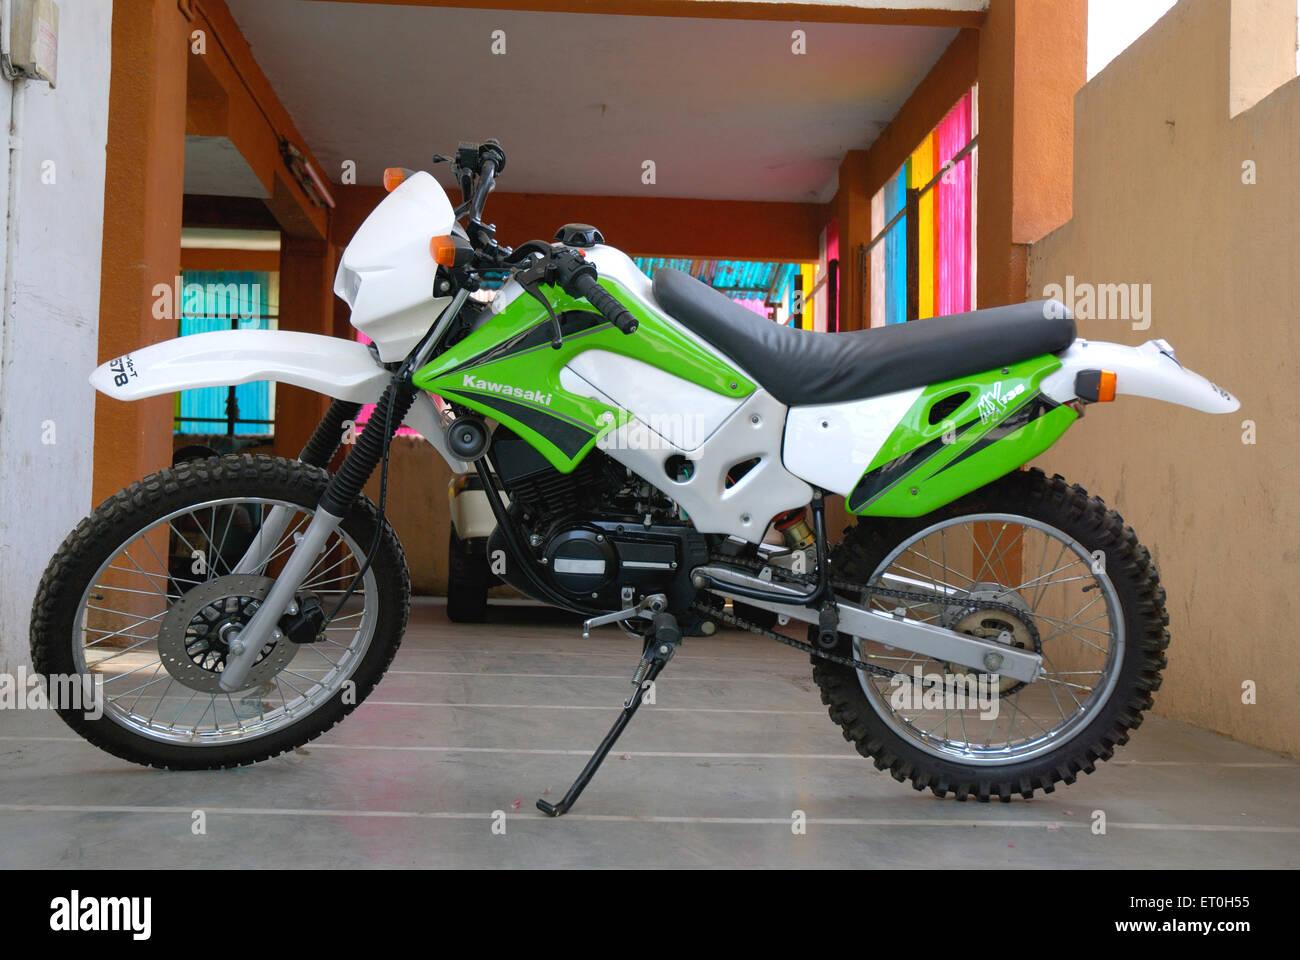 Dirt bike kawasaki - Stock Image